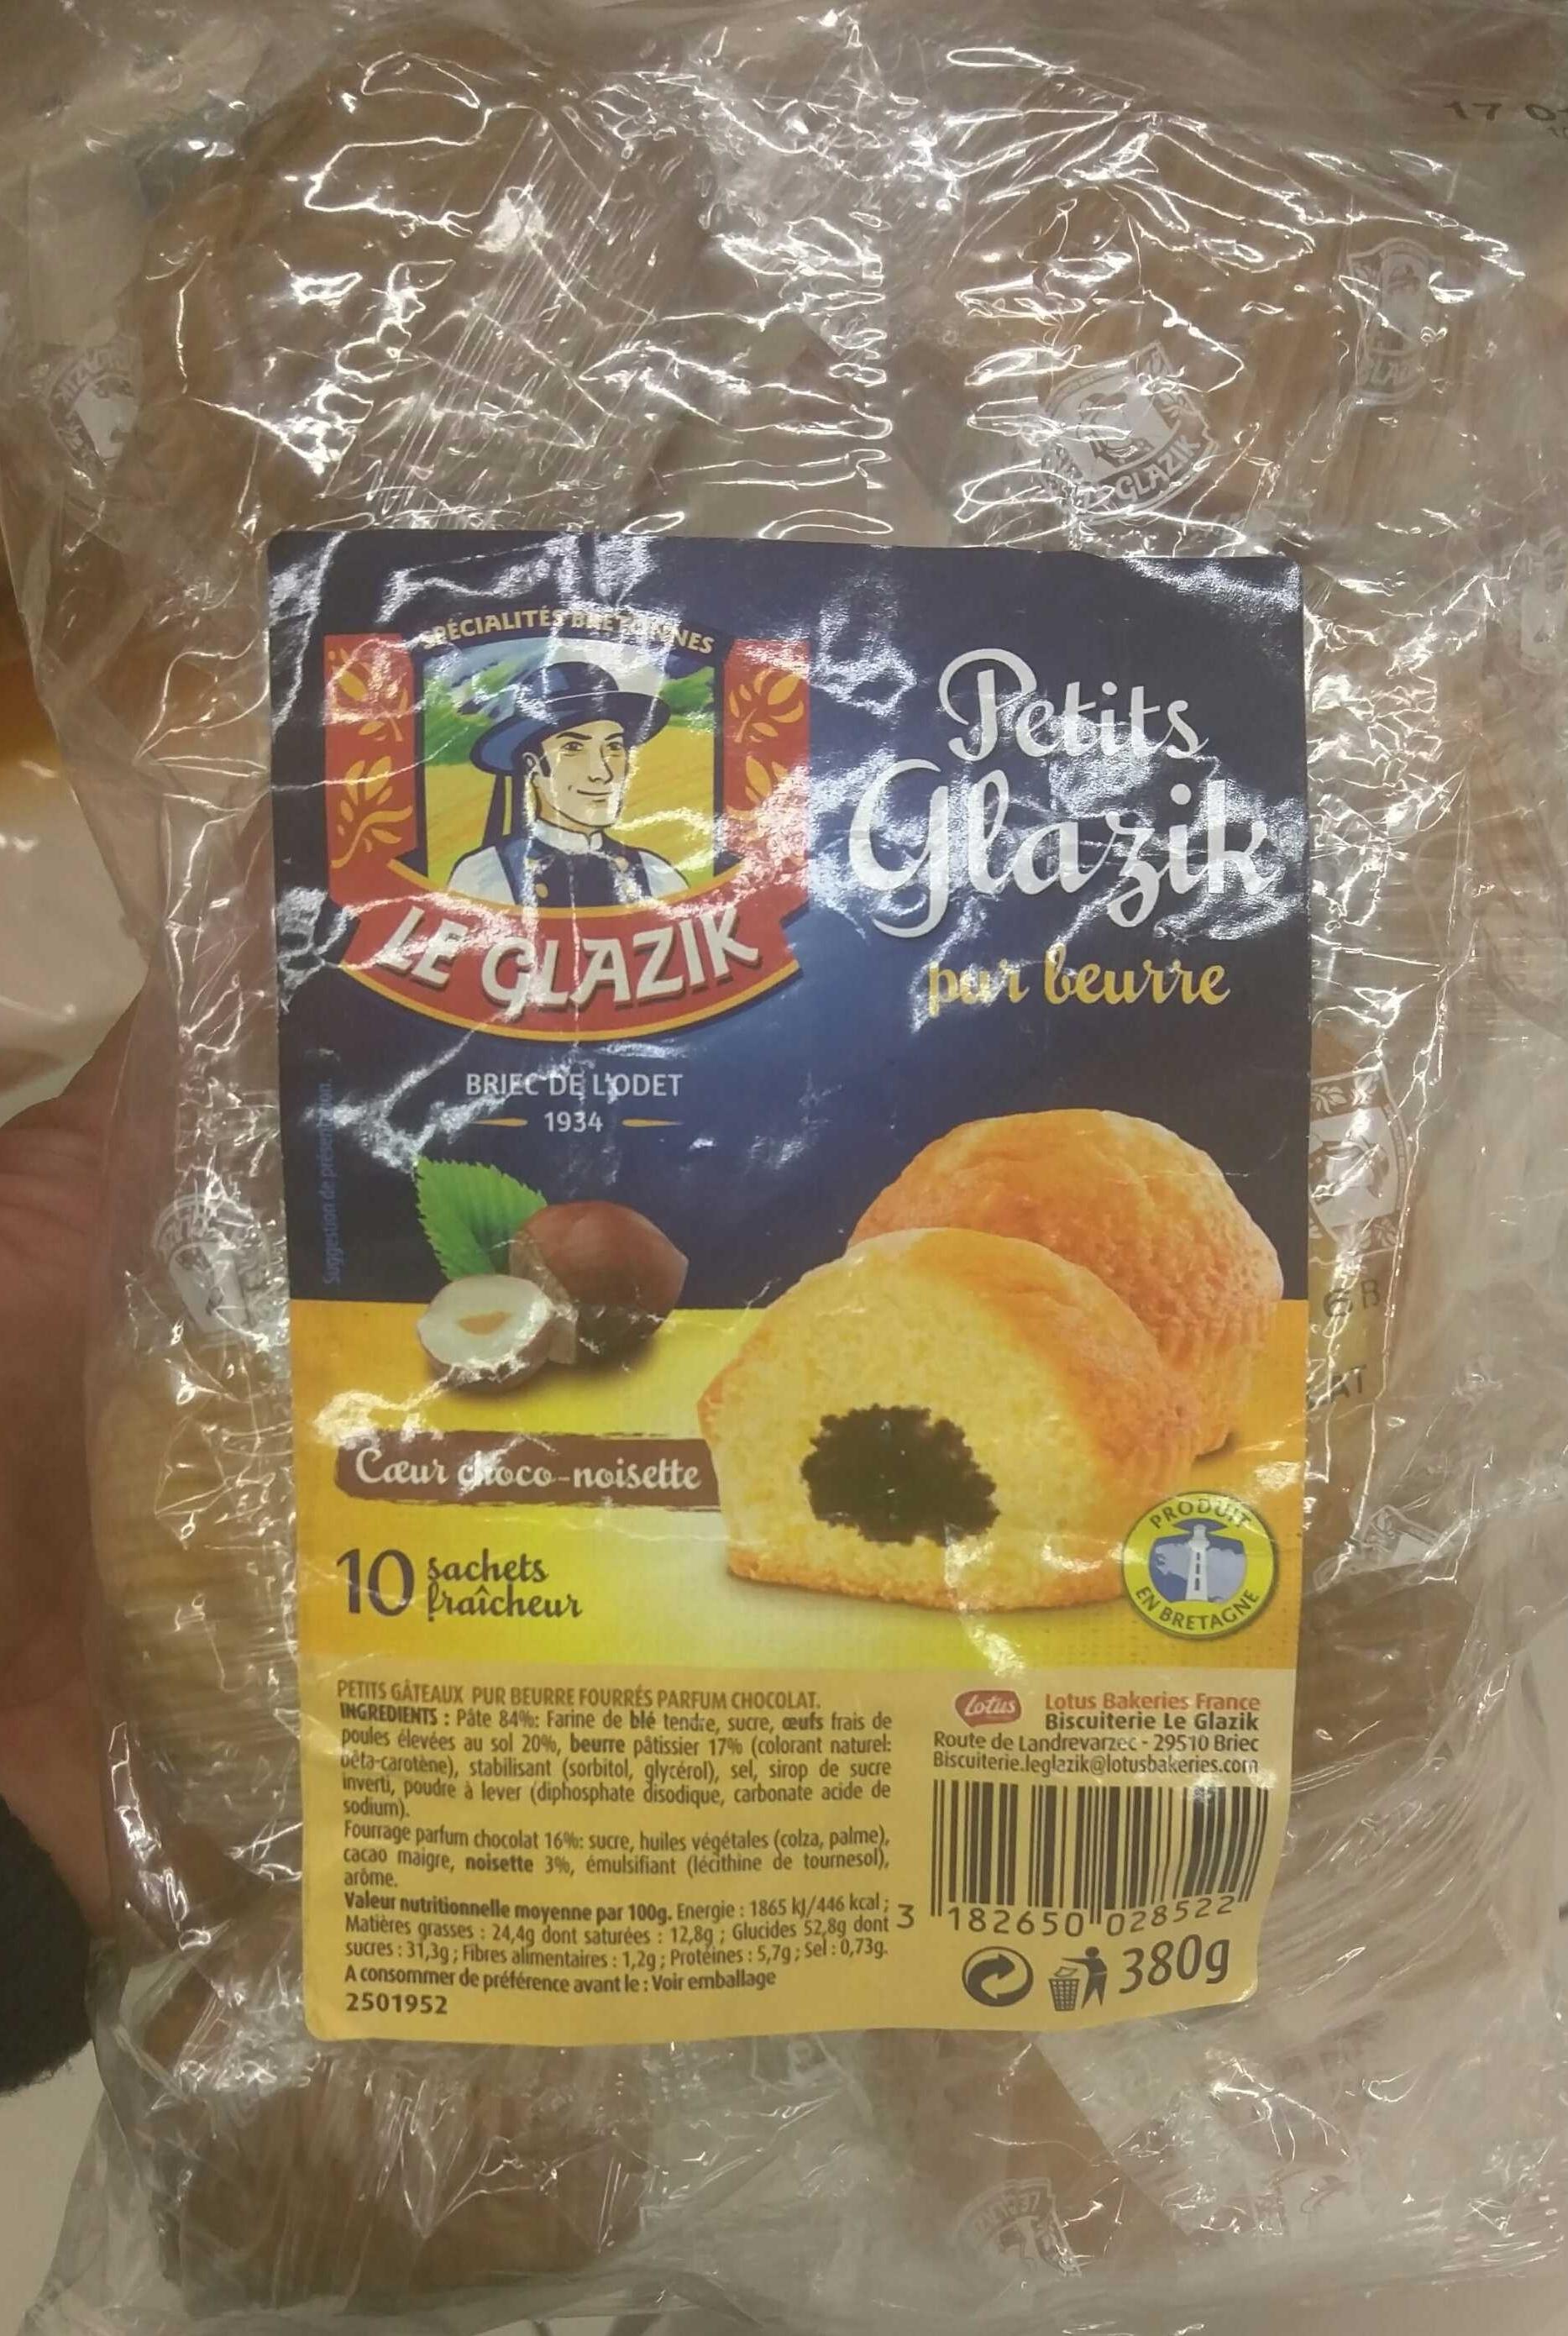 Petits Glazik Coeur Choco-Noisette - Product - fr